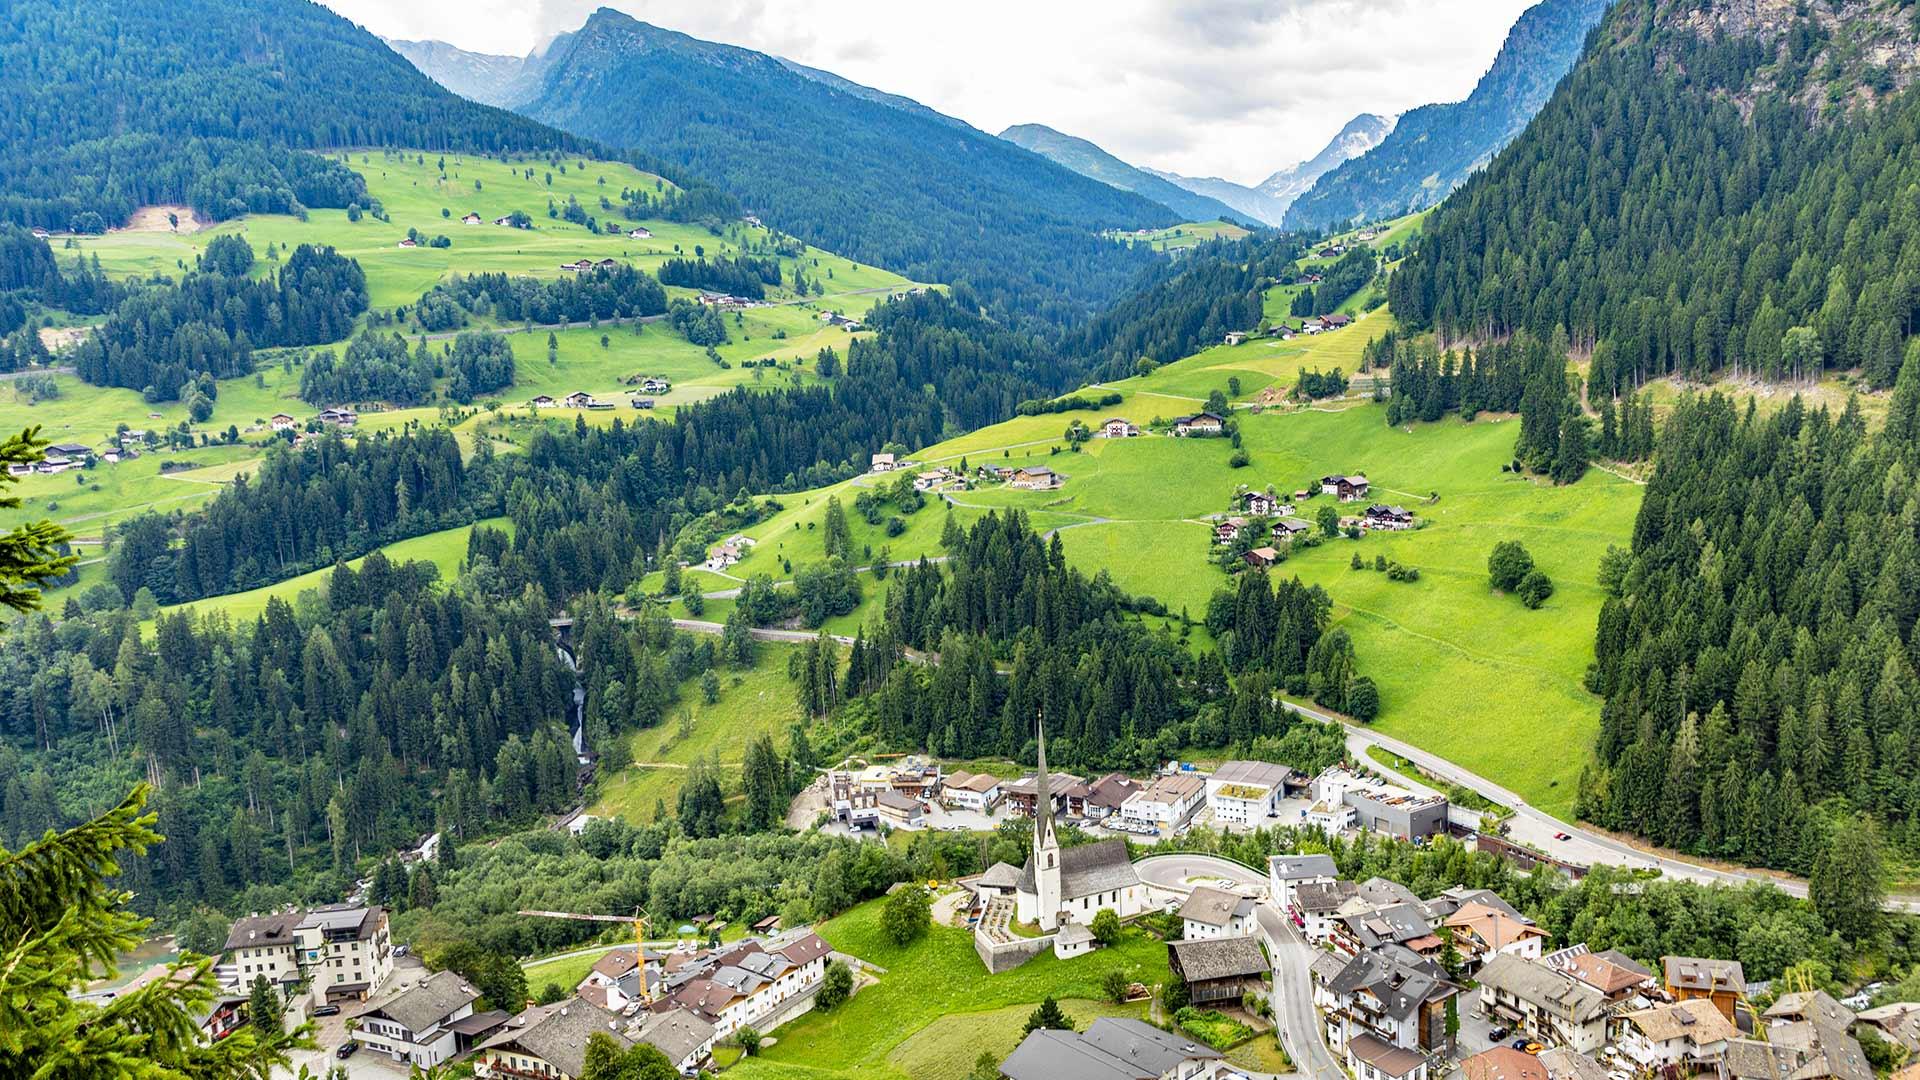 Urlaubsort - Moos in Passeier